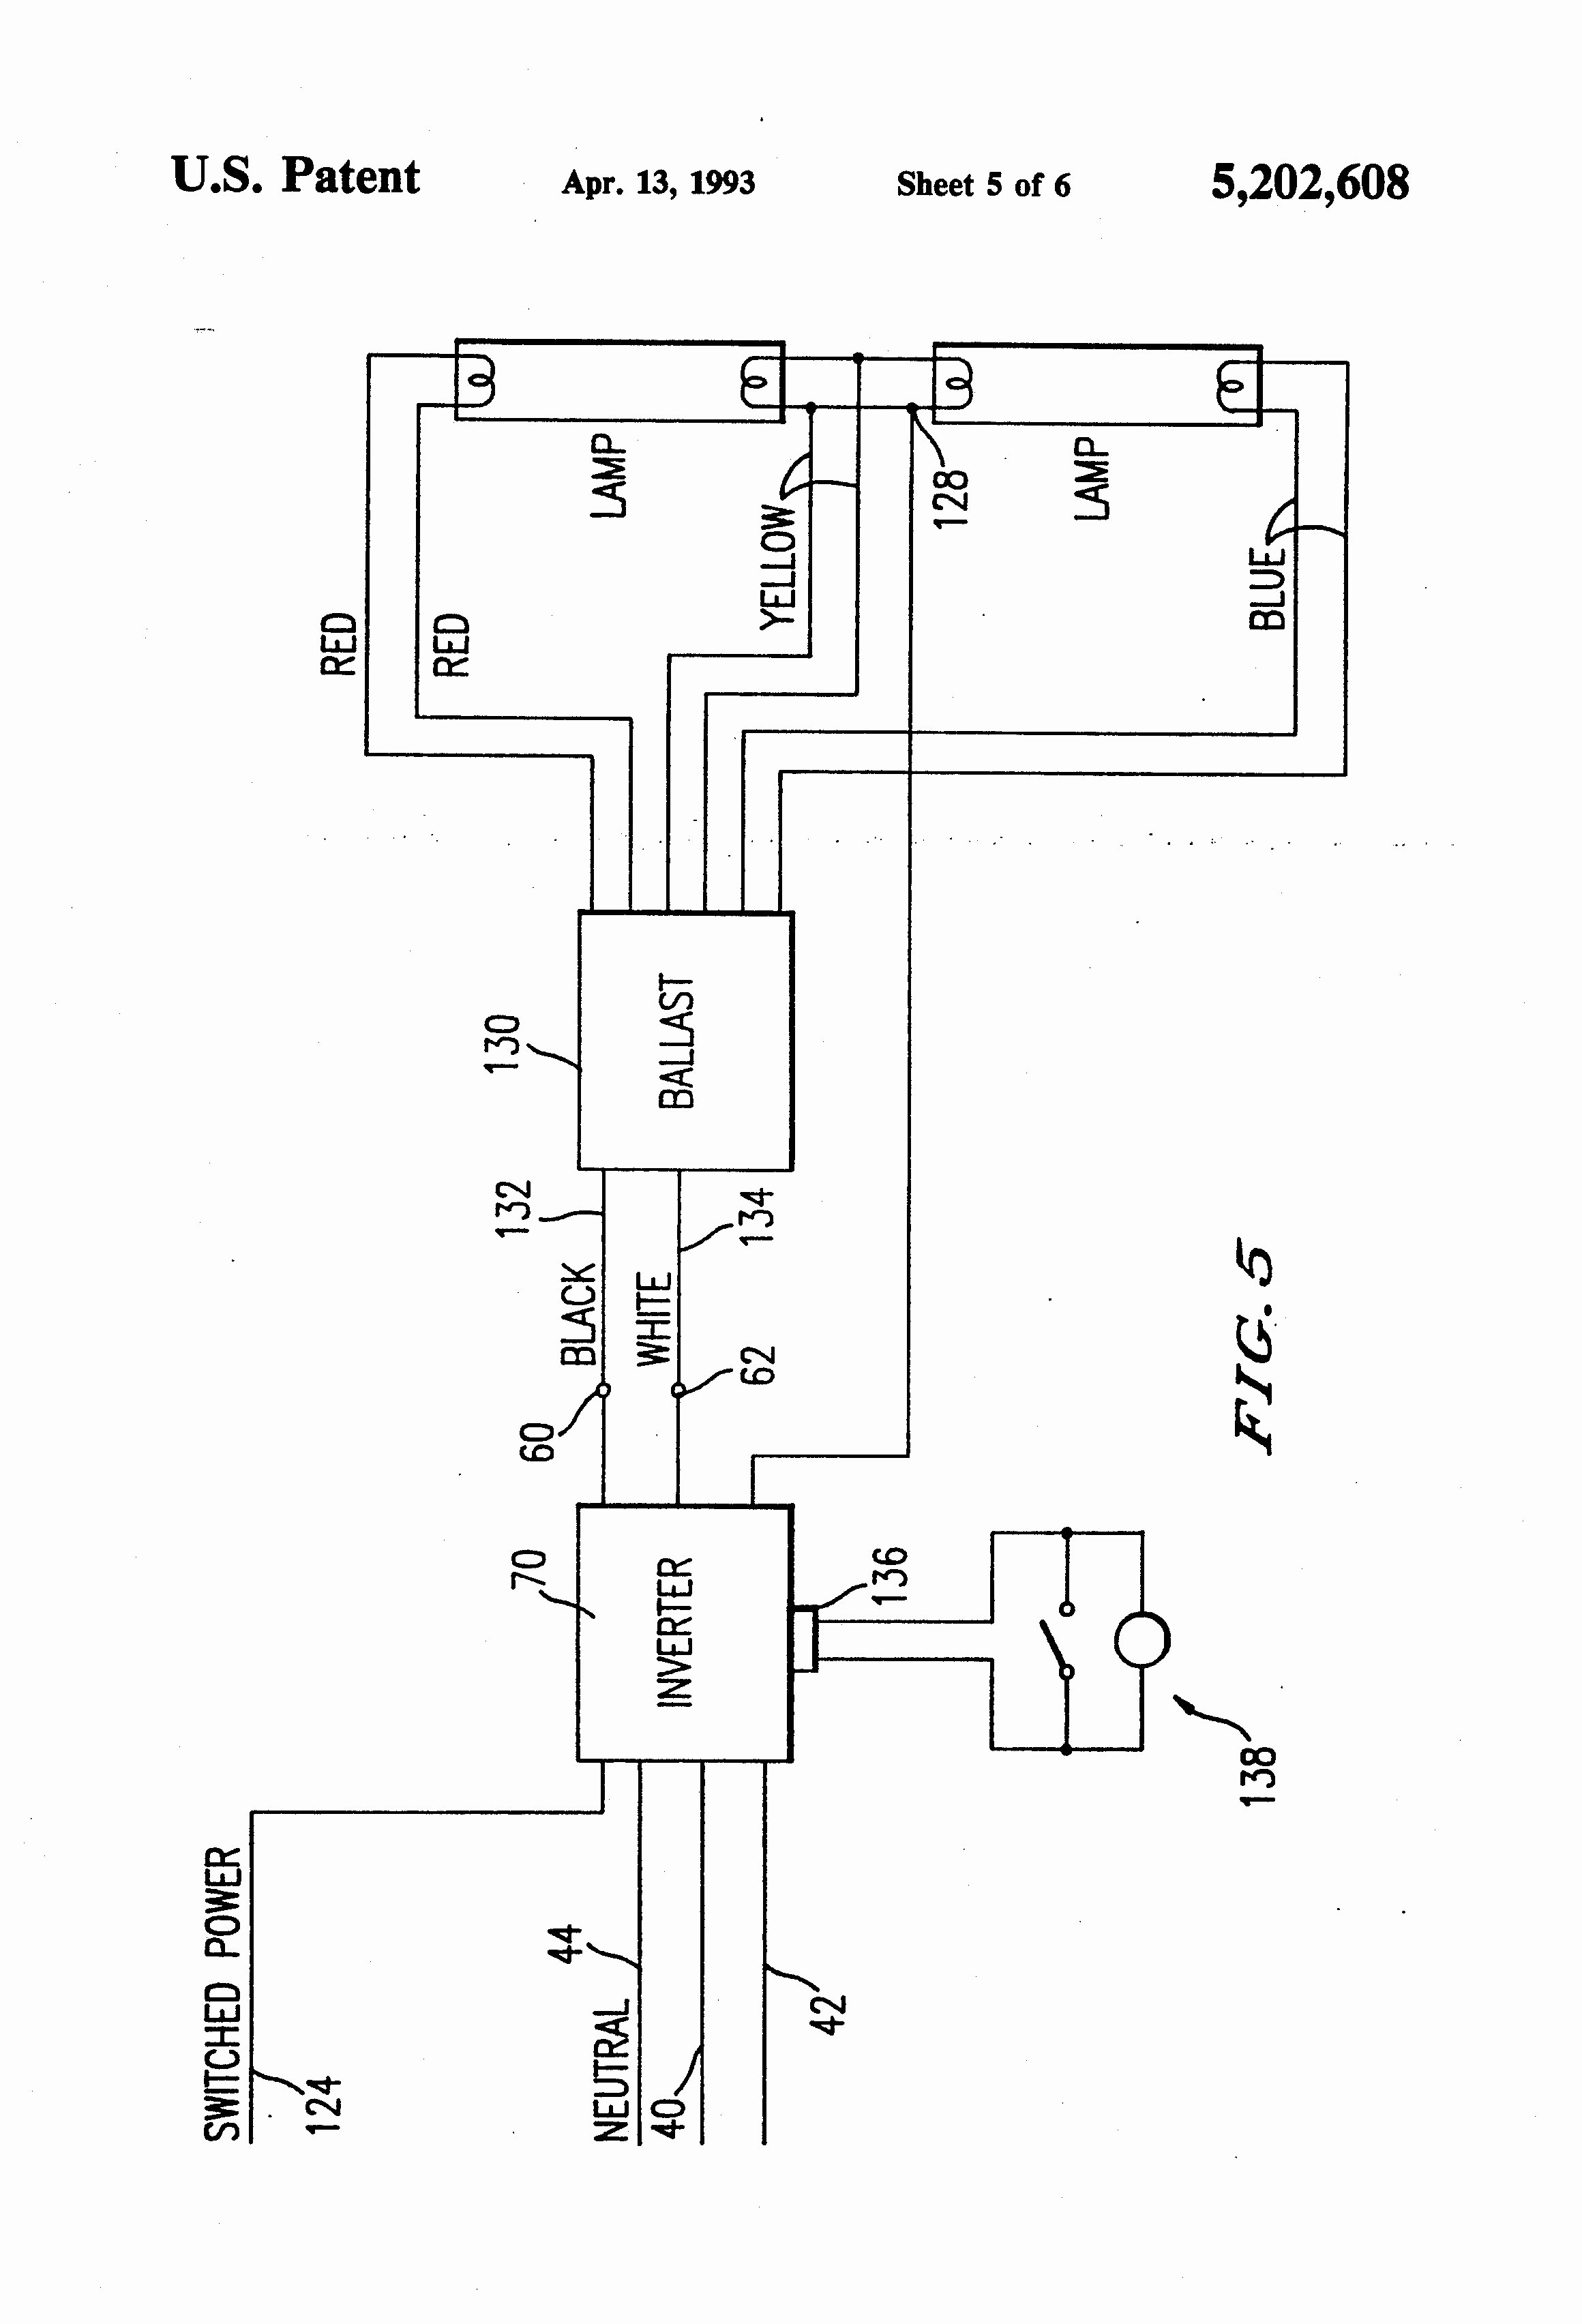 Advance T8 Ballast Wiring Diagram | Wiring Diagram - Philips Advance Ballast Wiring Diagram